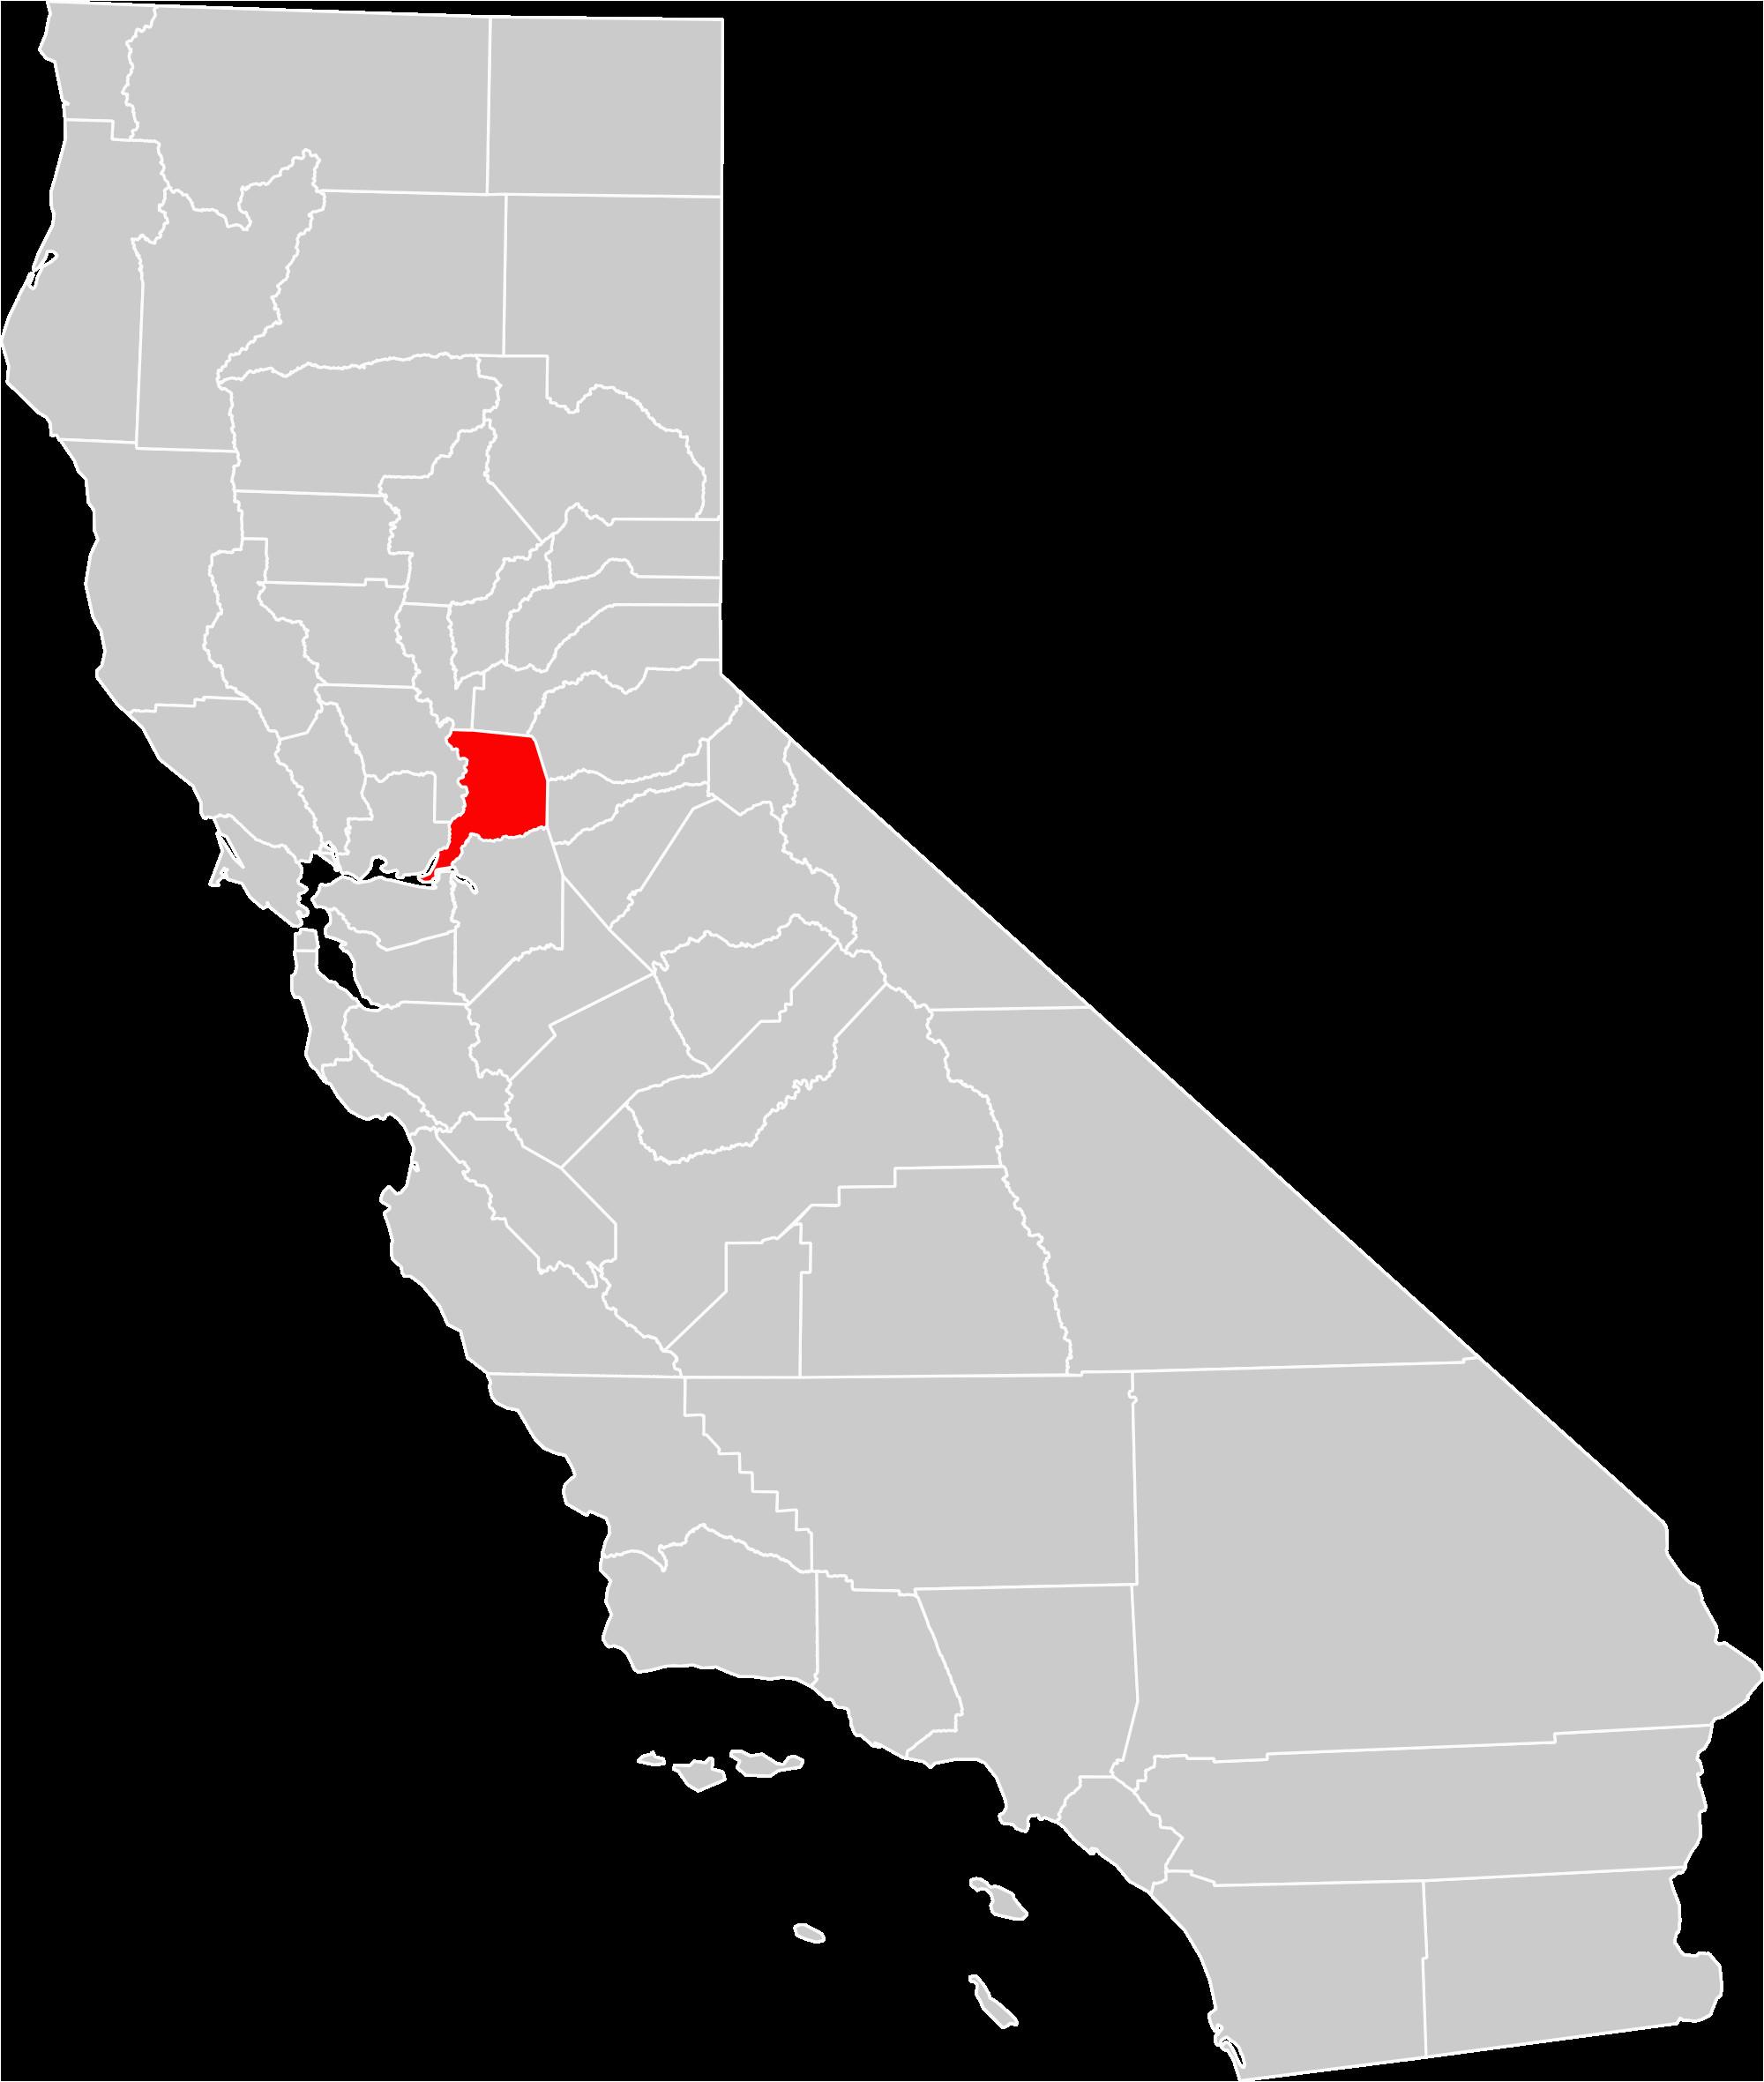 California Maps by County | secretmuseum